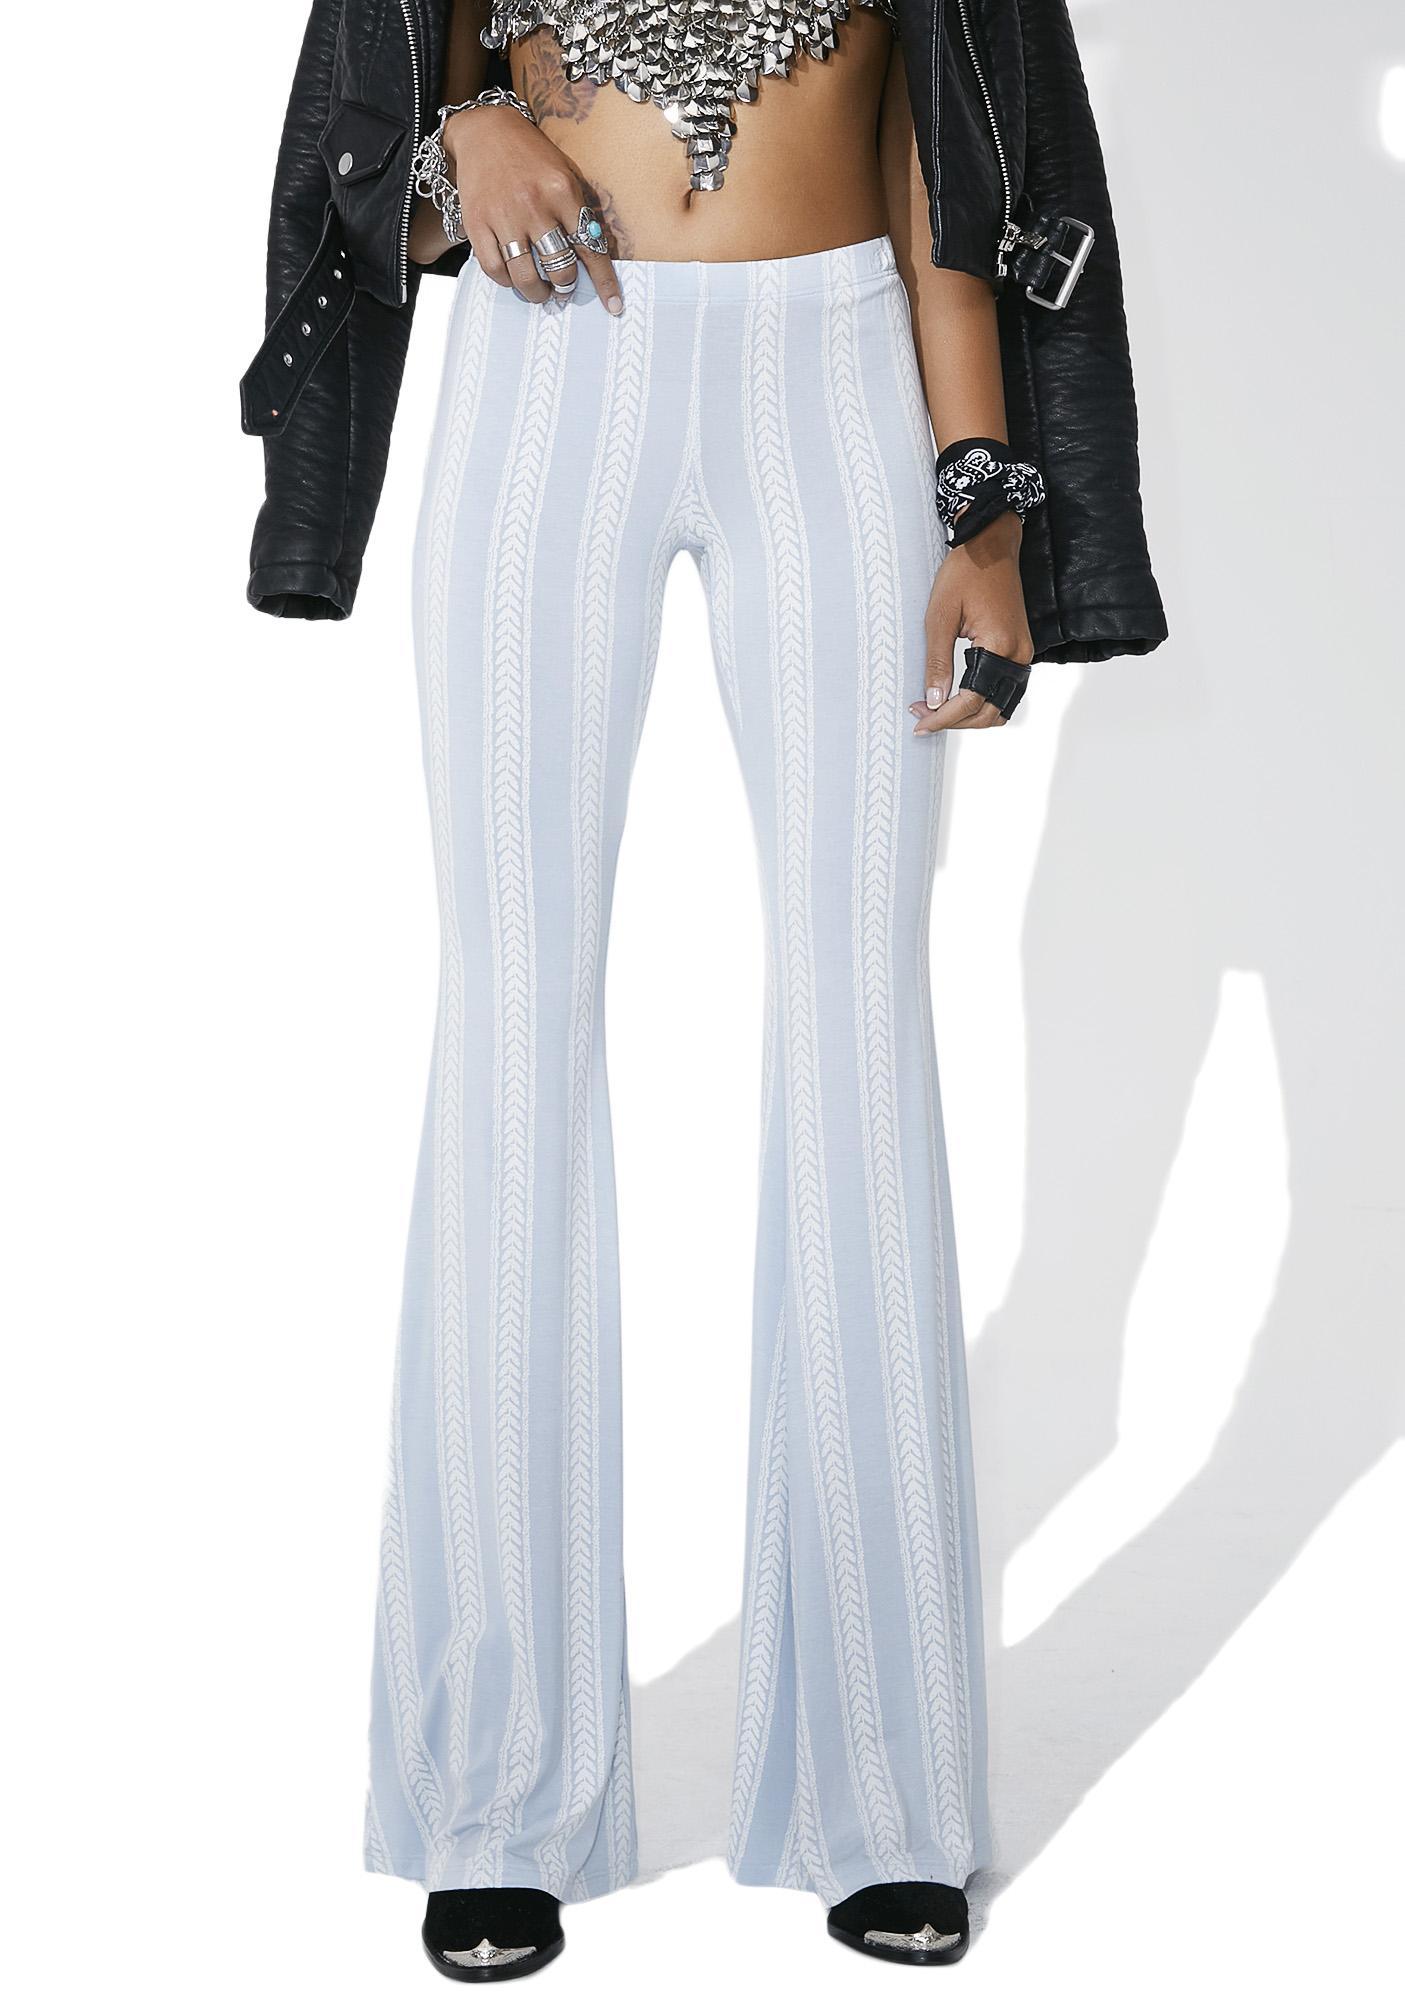 Lira Clothing Arctic Kaya Bell Pants